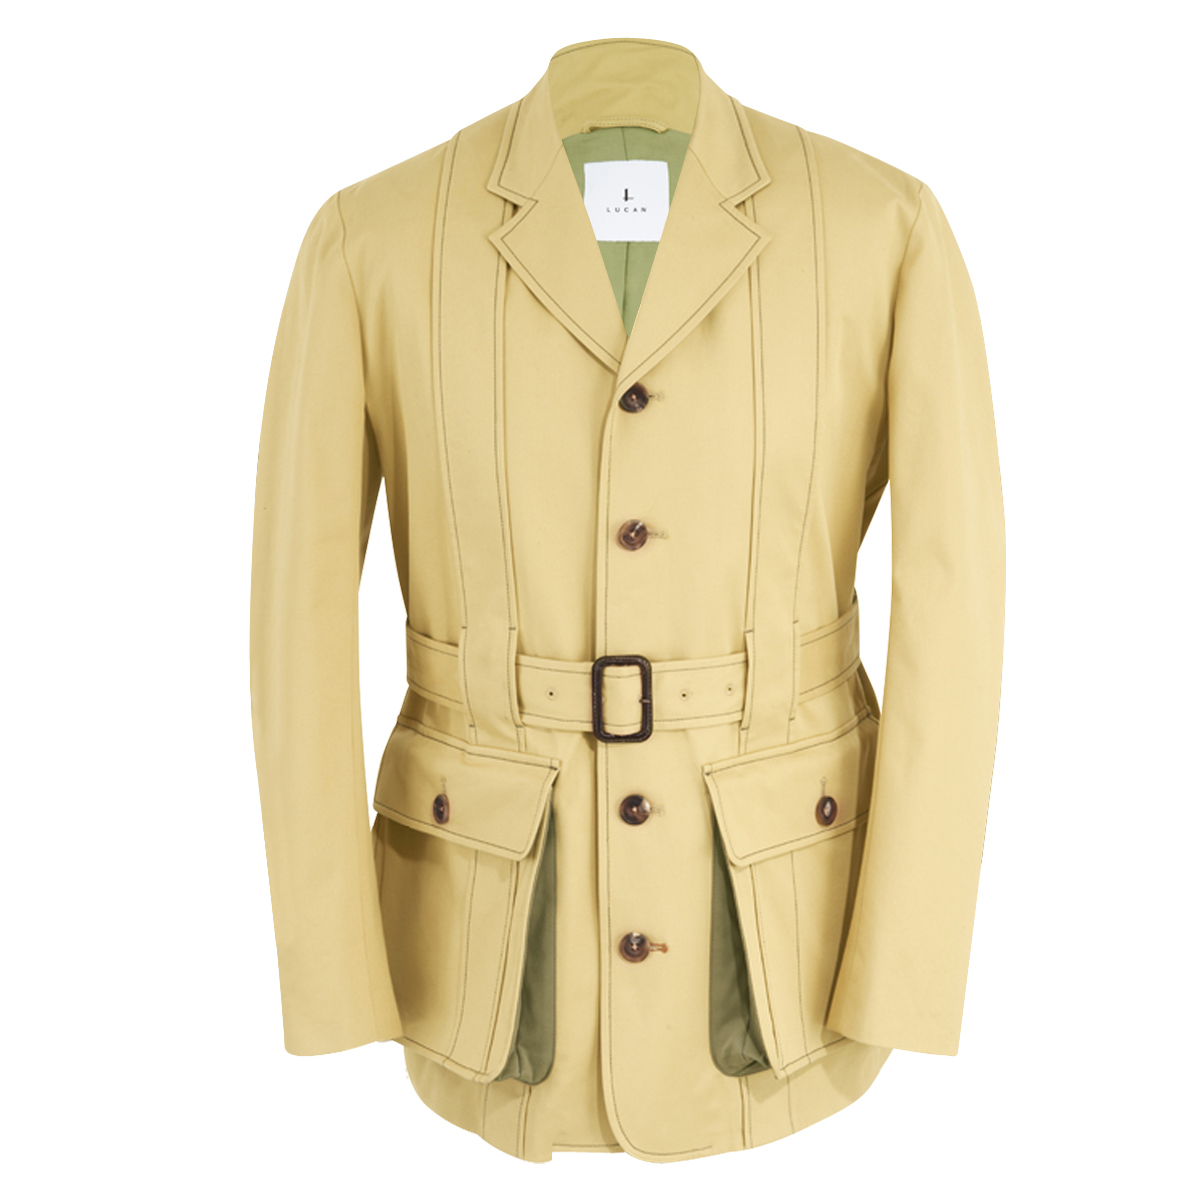 Sandstone Cotton Twill Safari Norfolk Jacket